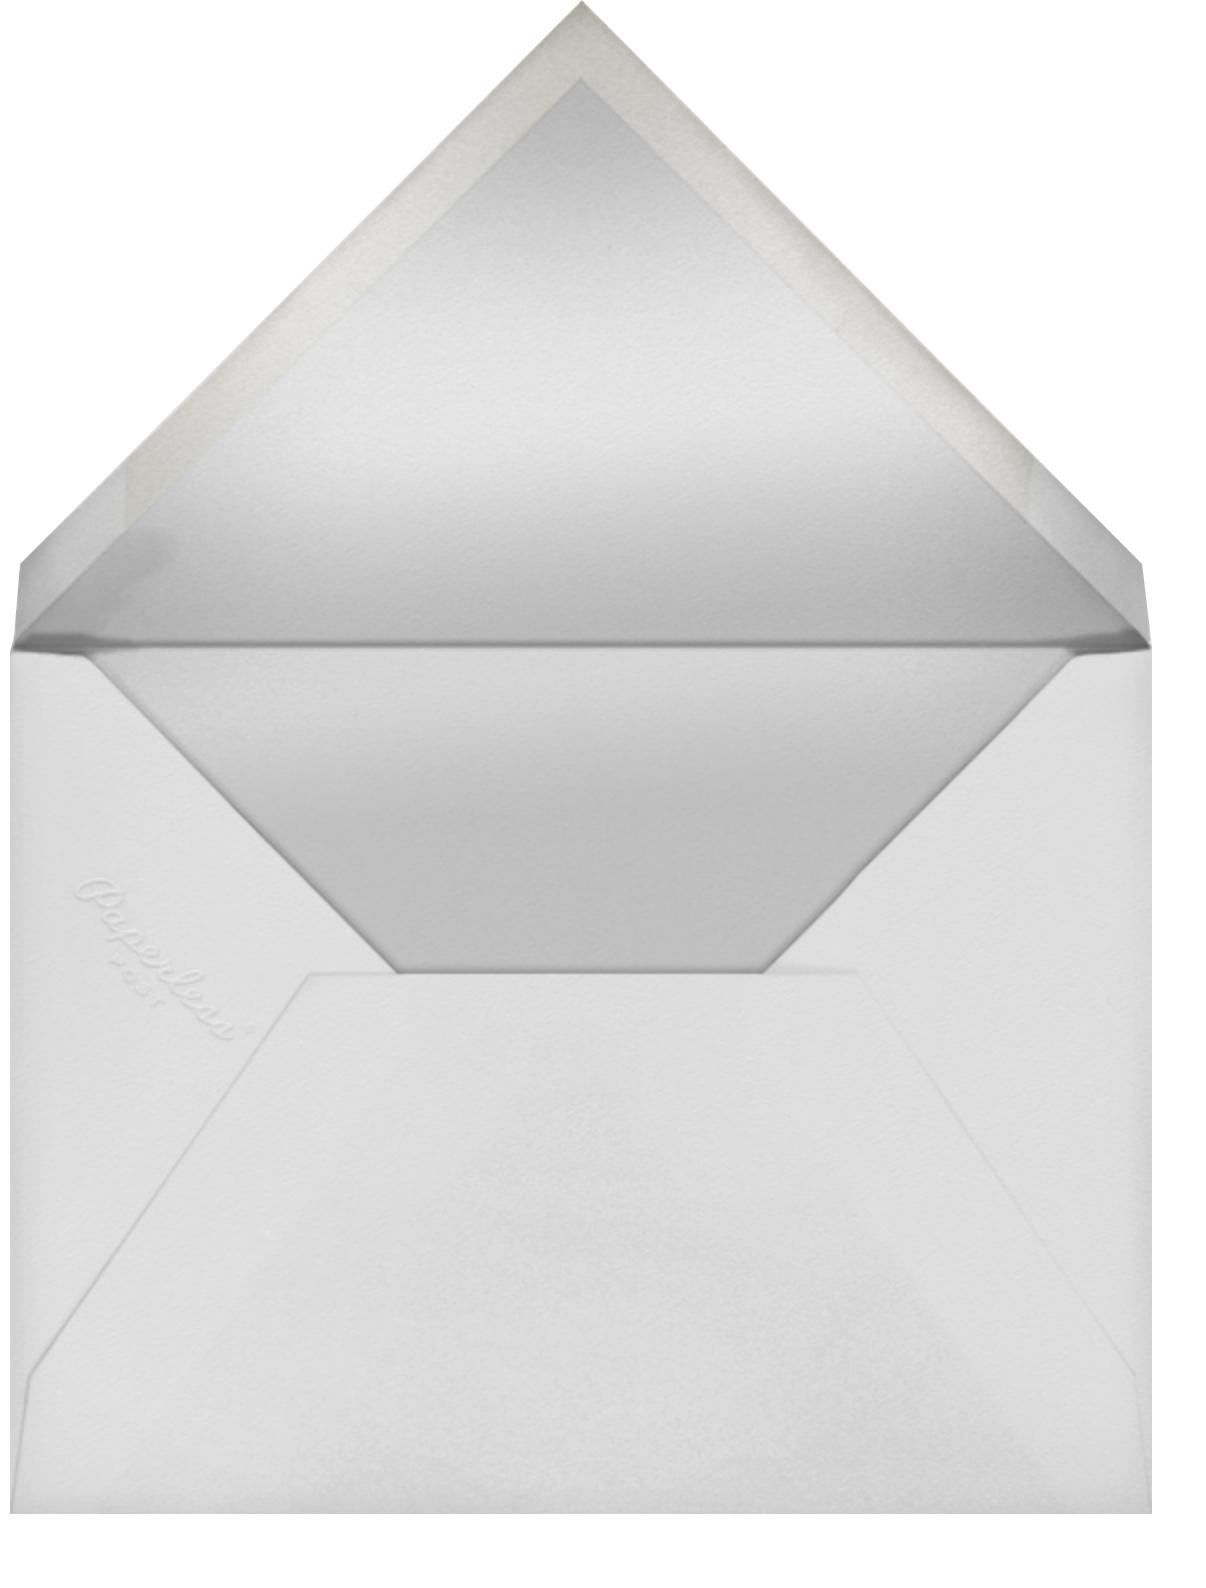 Vineyard I (Menu) - Gold - Paperless Post - Menus - envelope back